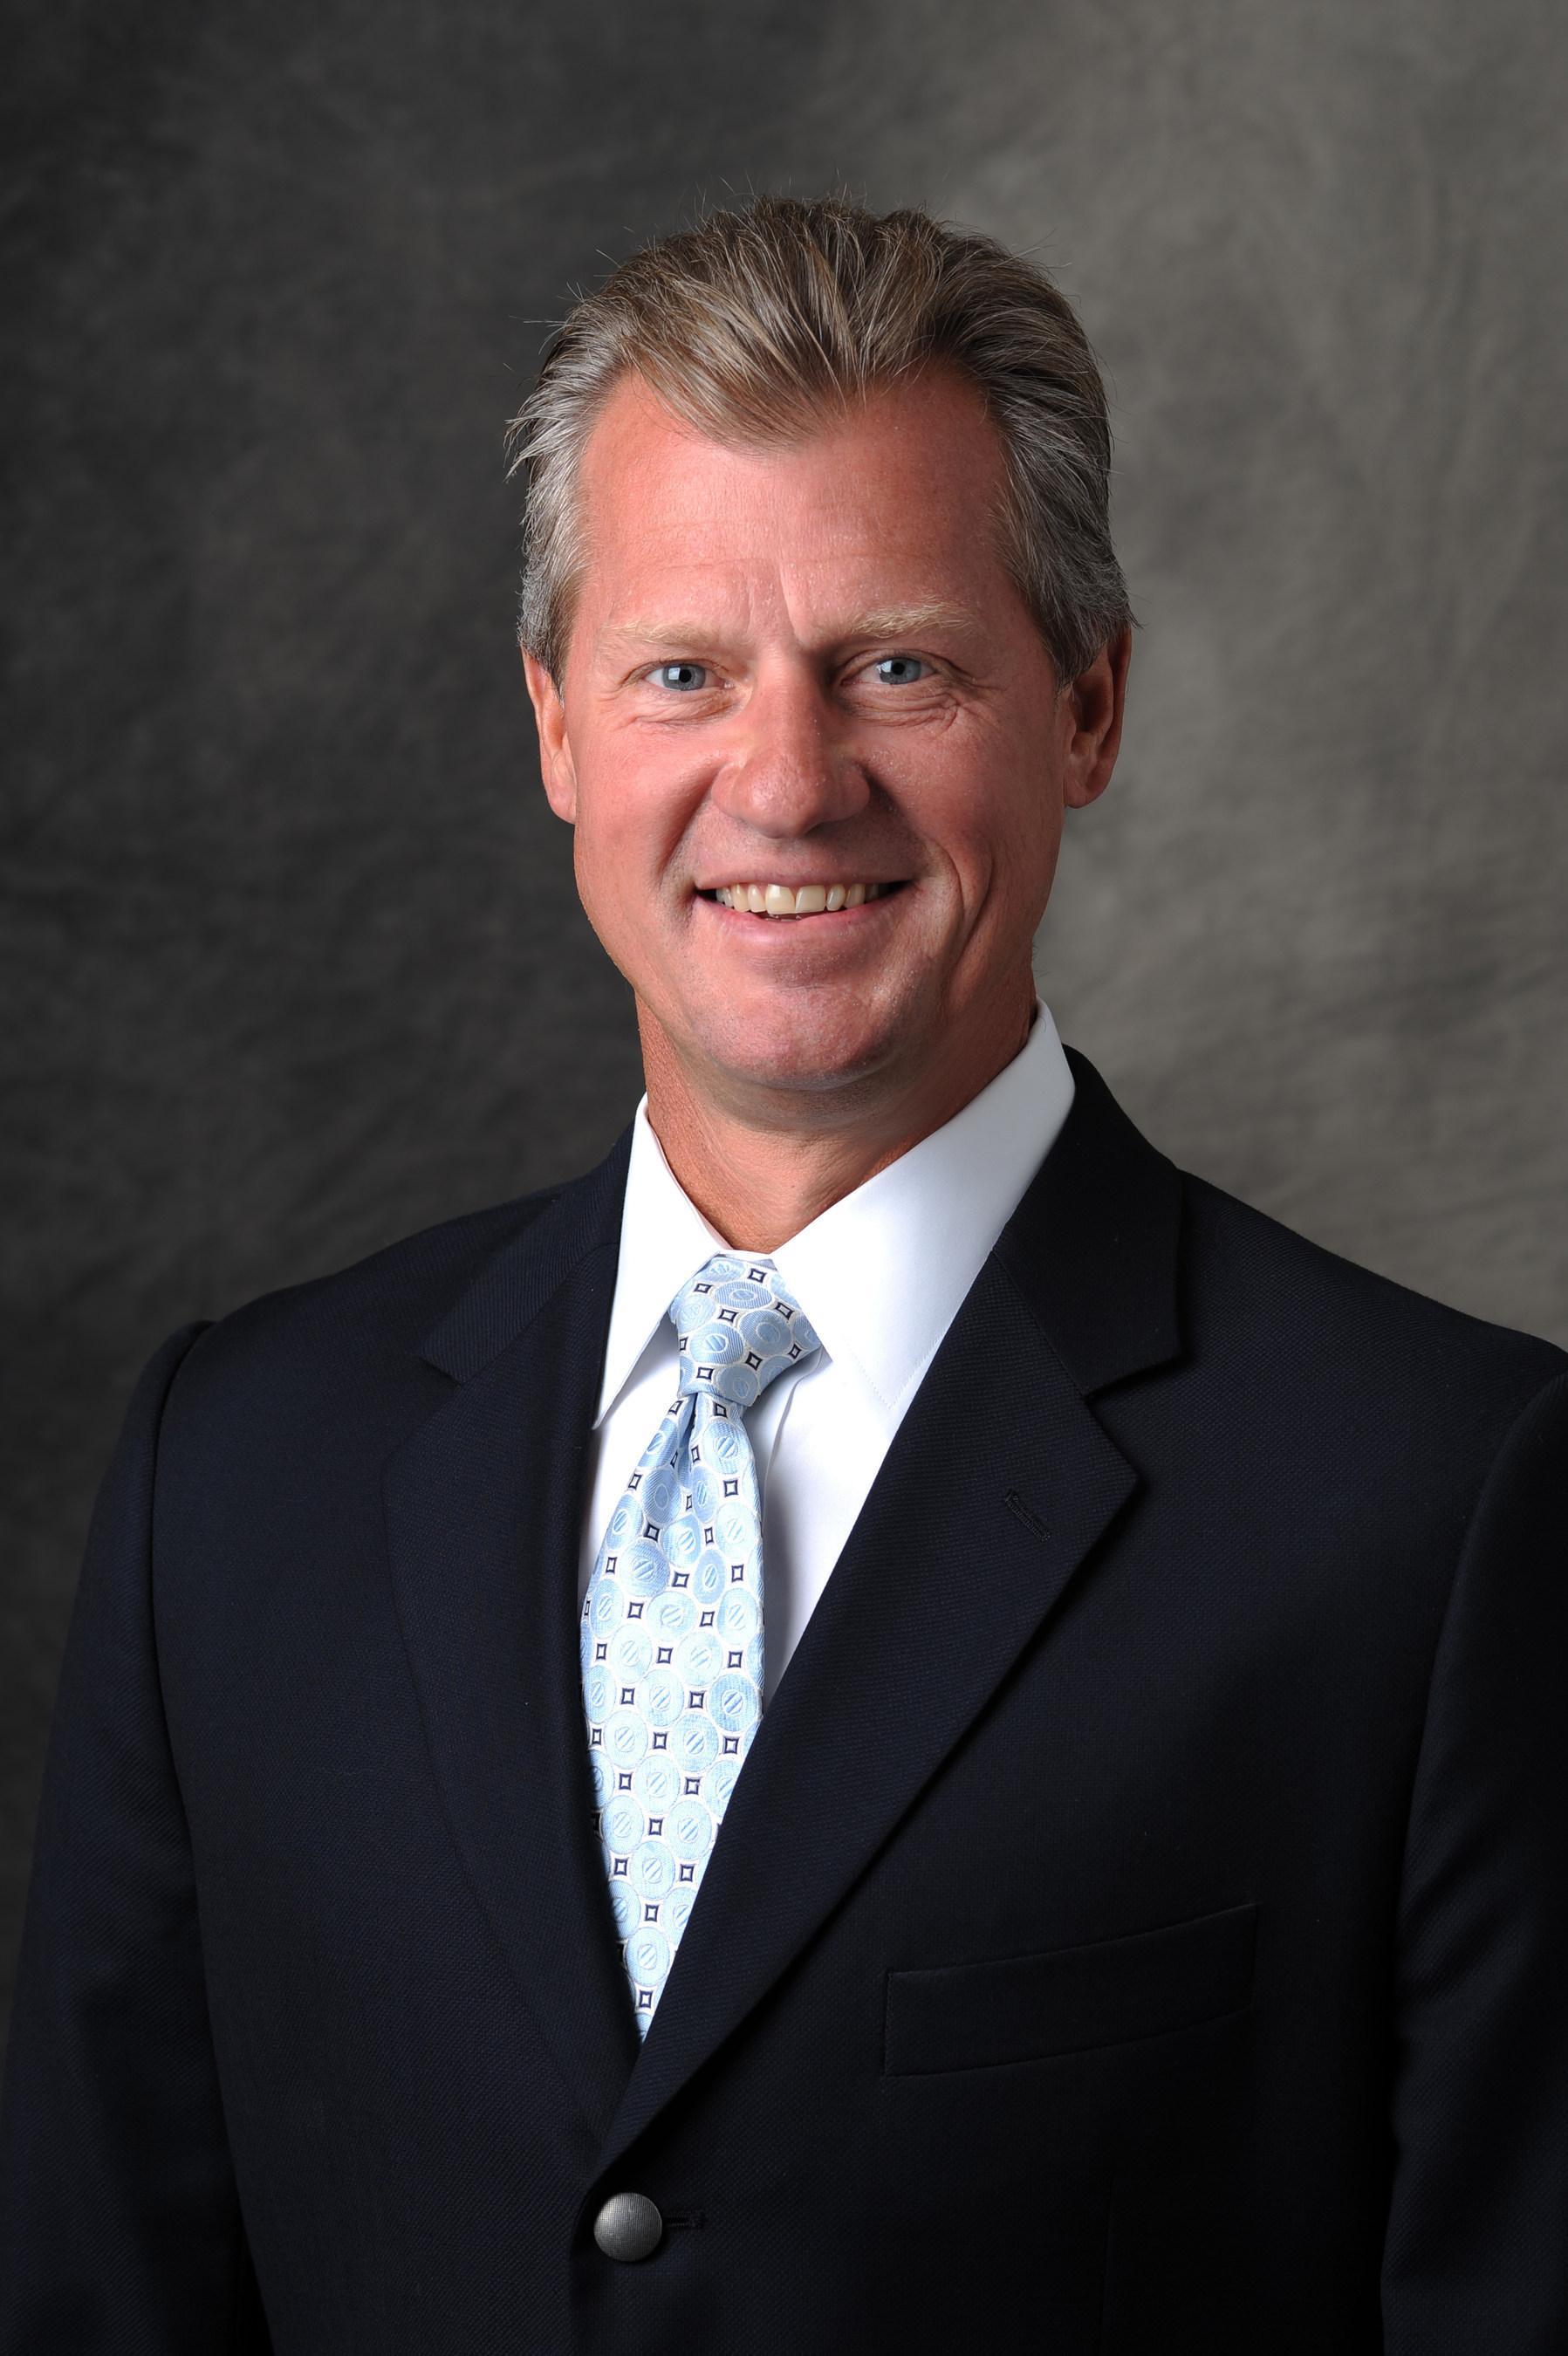 Mr. Greg Webb, president for Sabre Travel Network